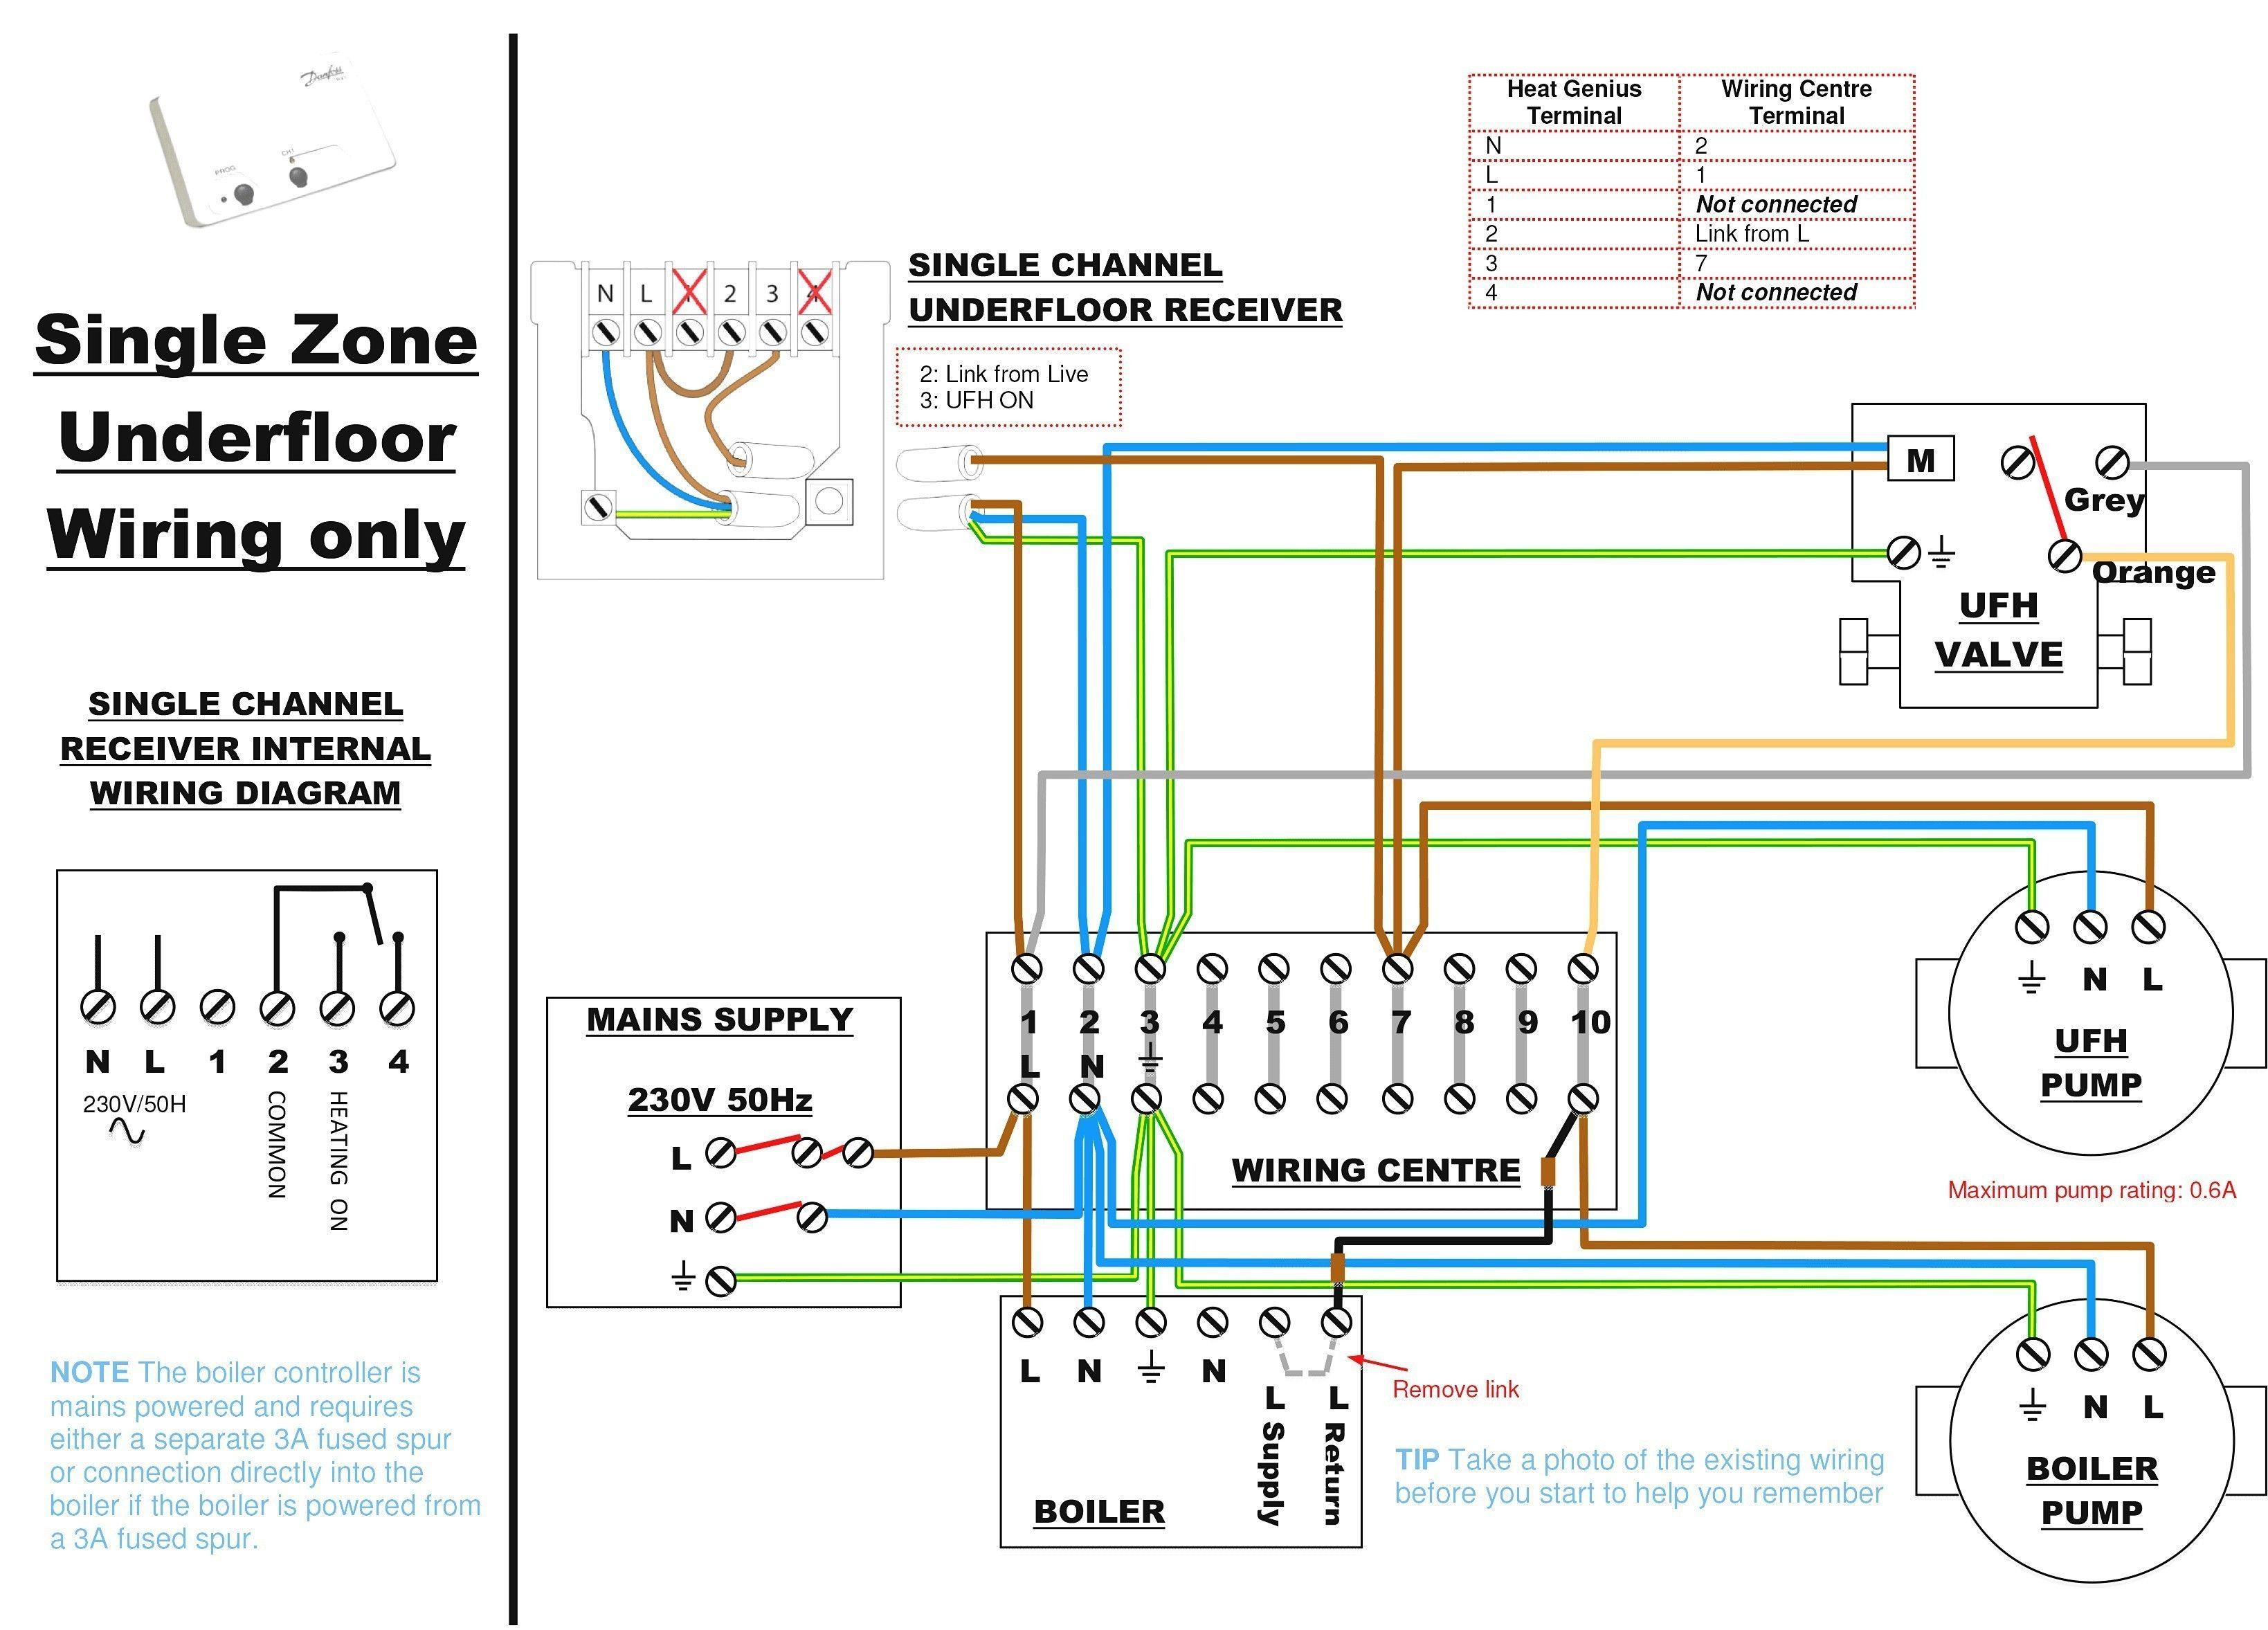 Luxury Wiring Diagram Combi Boiler diagrams